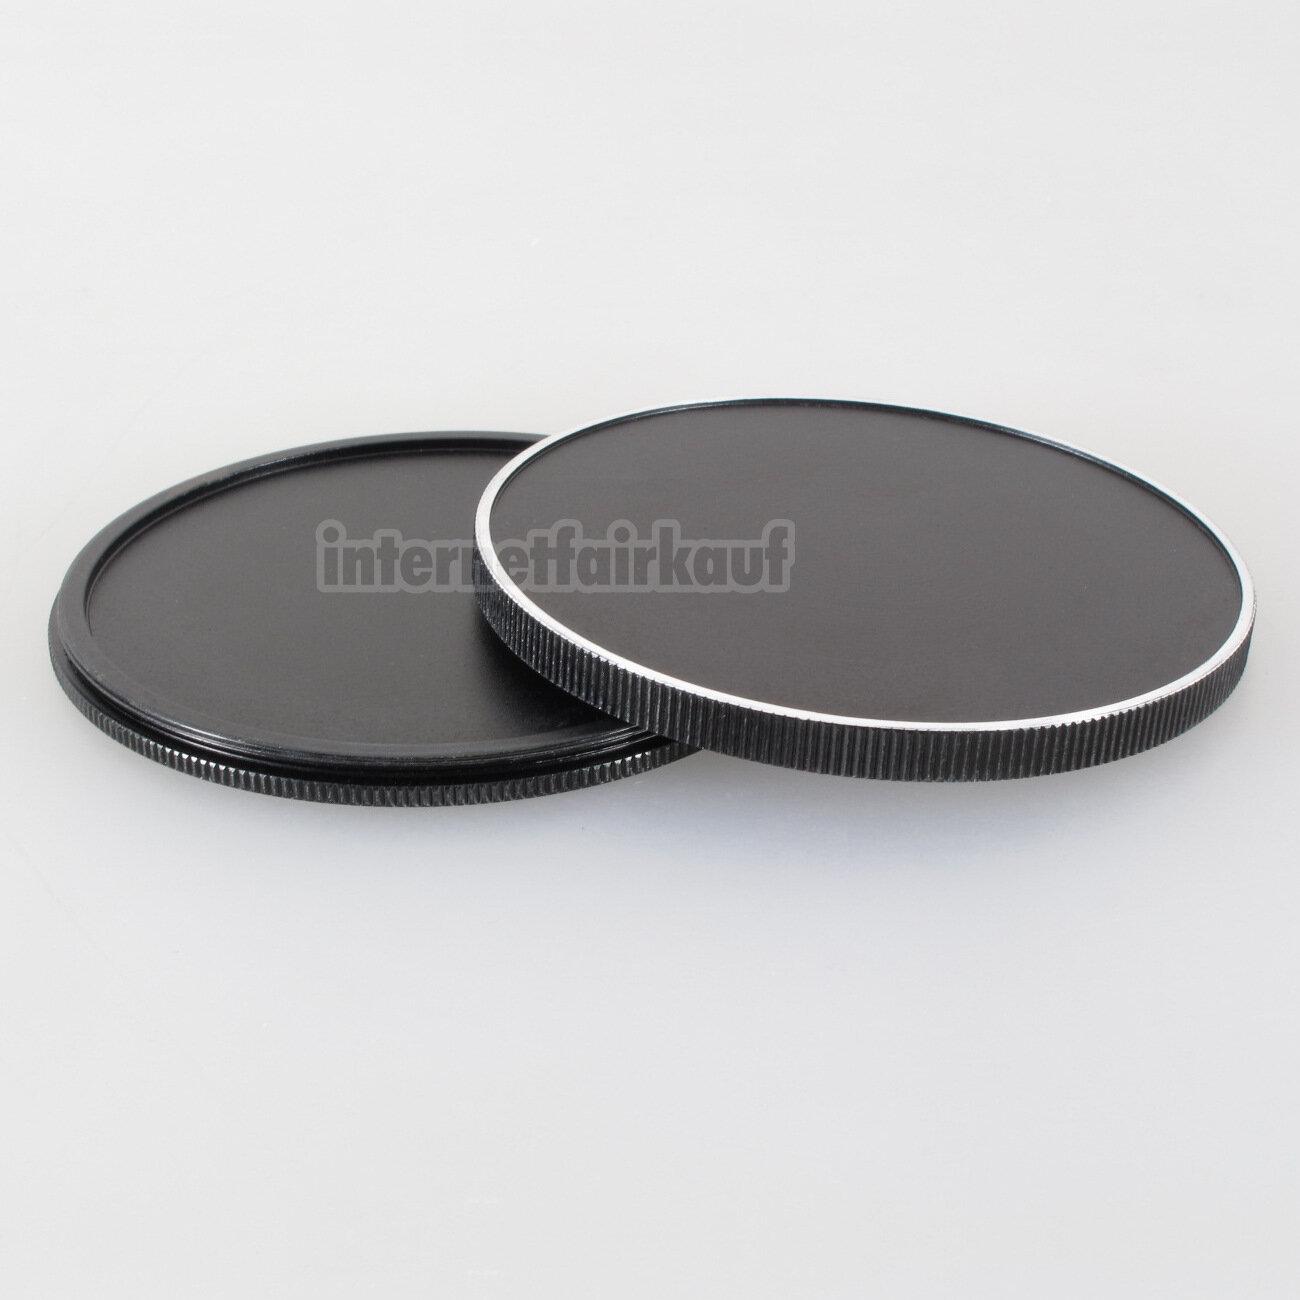 55mm Stack Caps Filterkappen Filter Container